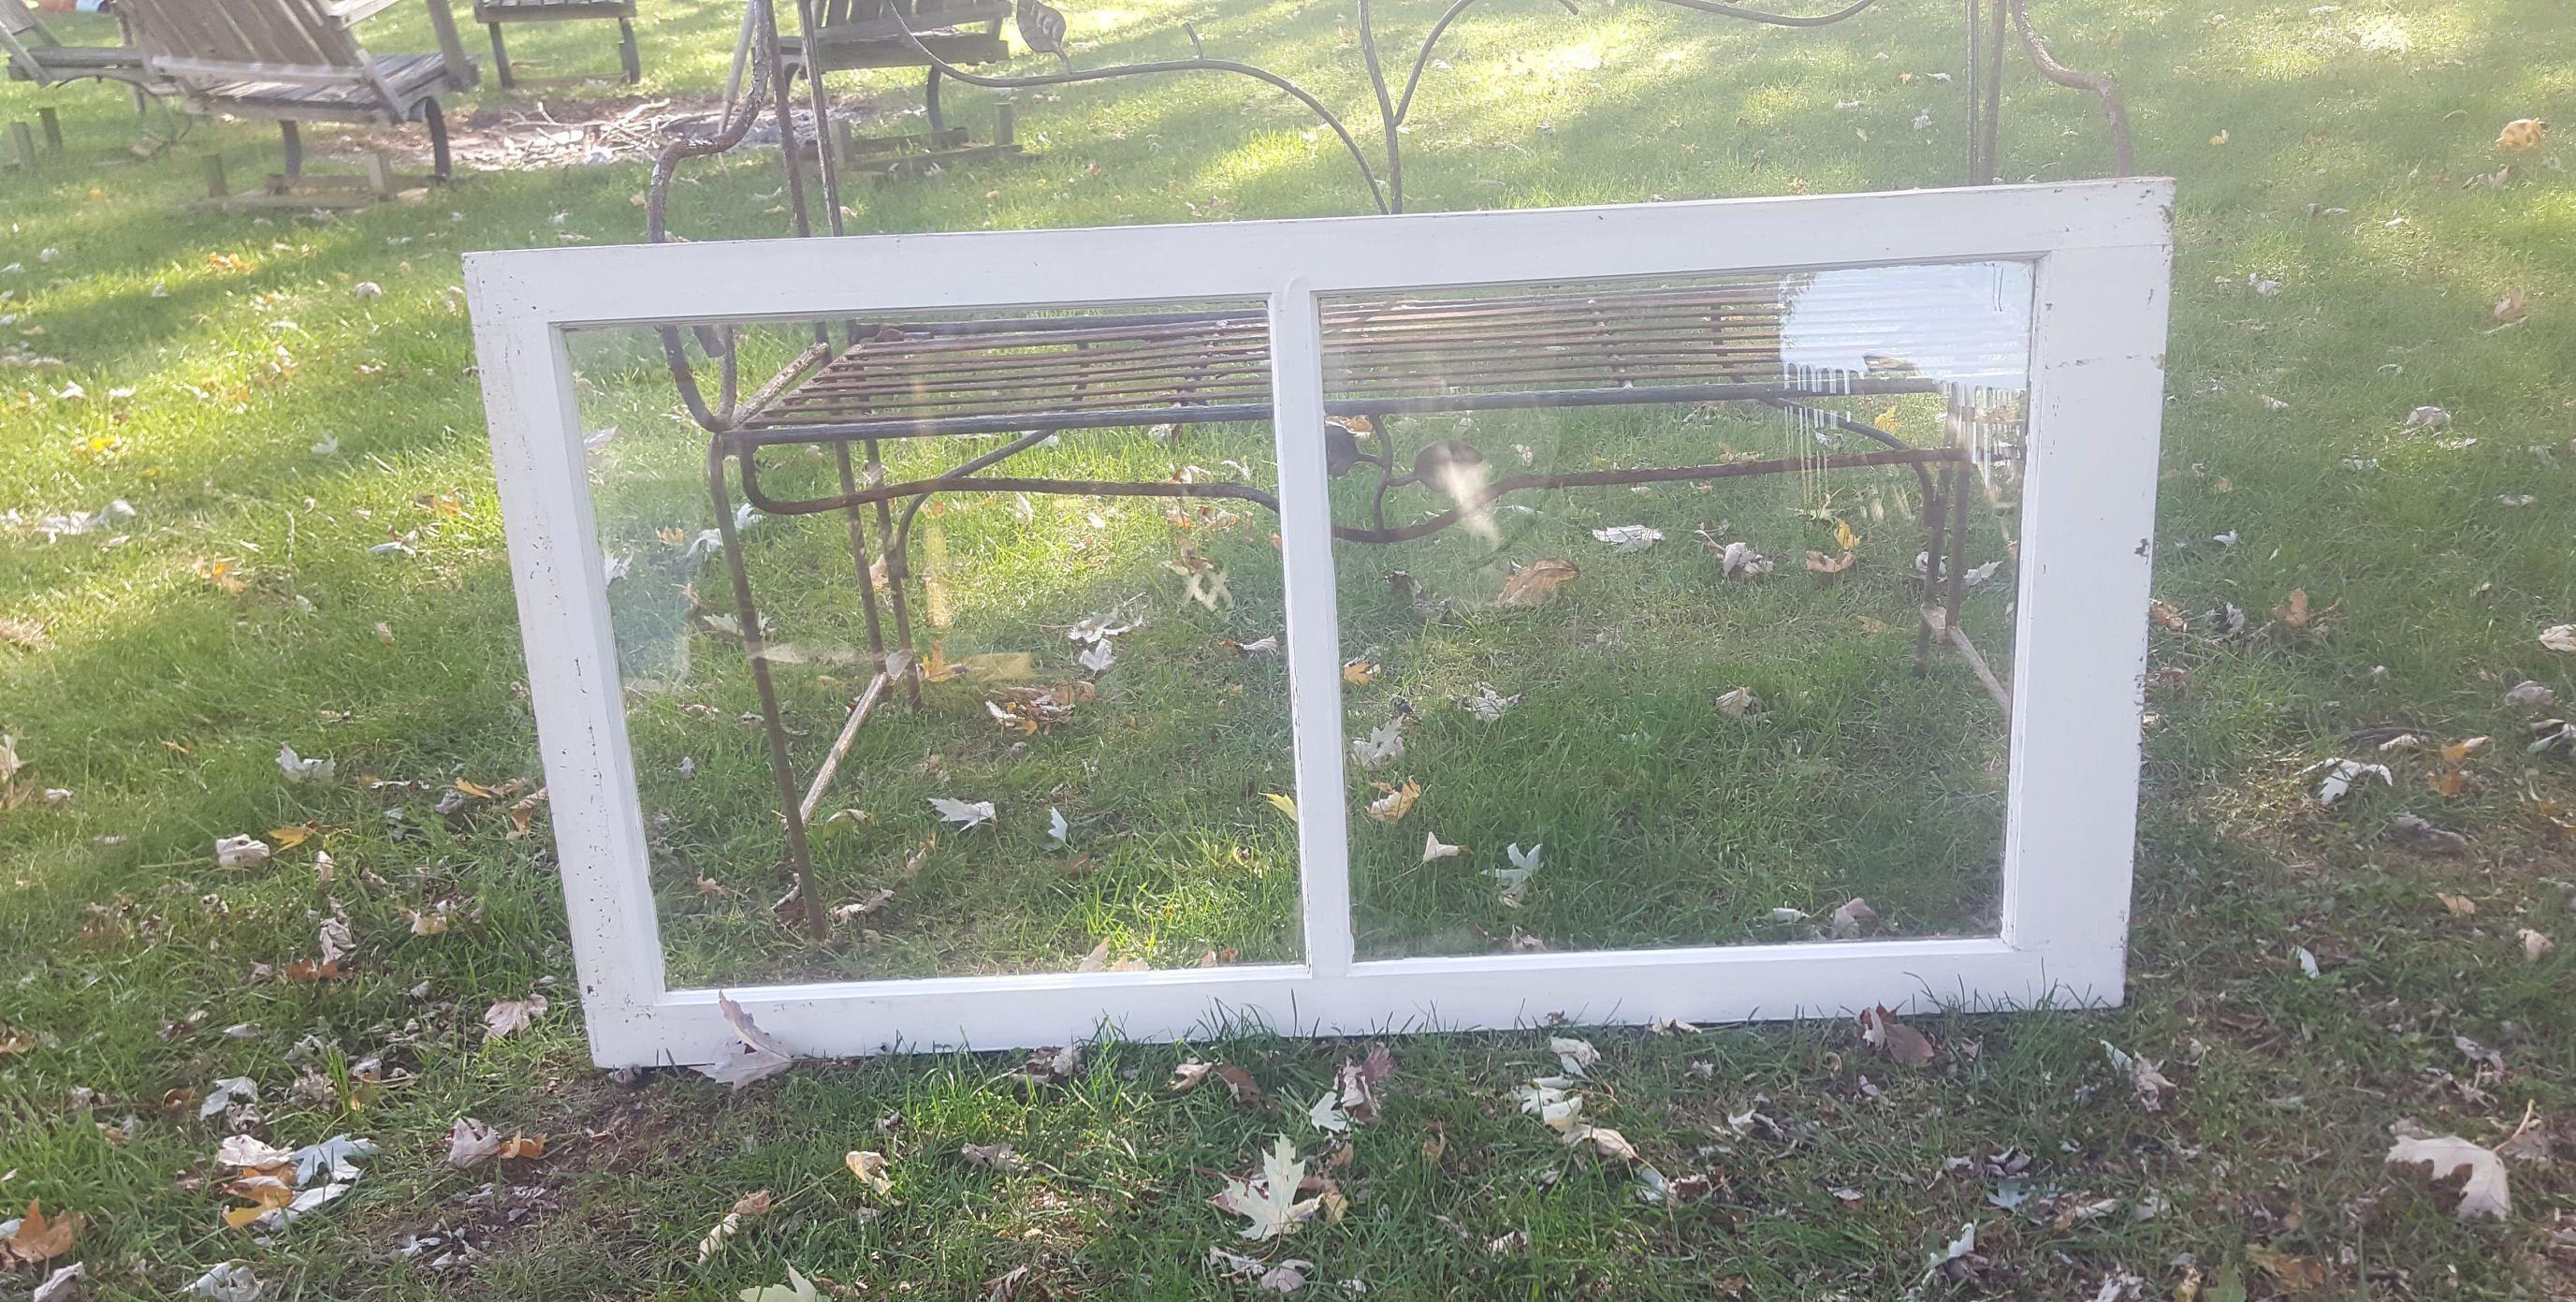 6 pane window ideas  vintage wood window frame two  pane sash french country modern